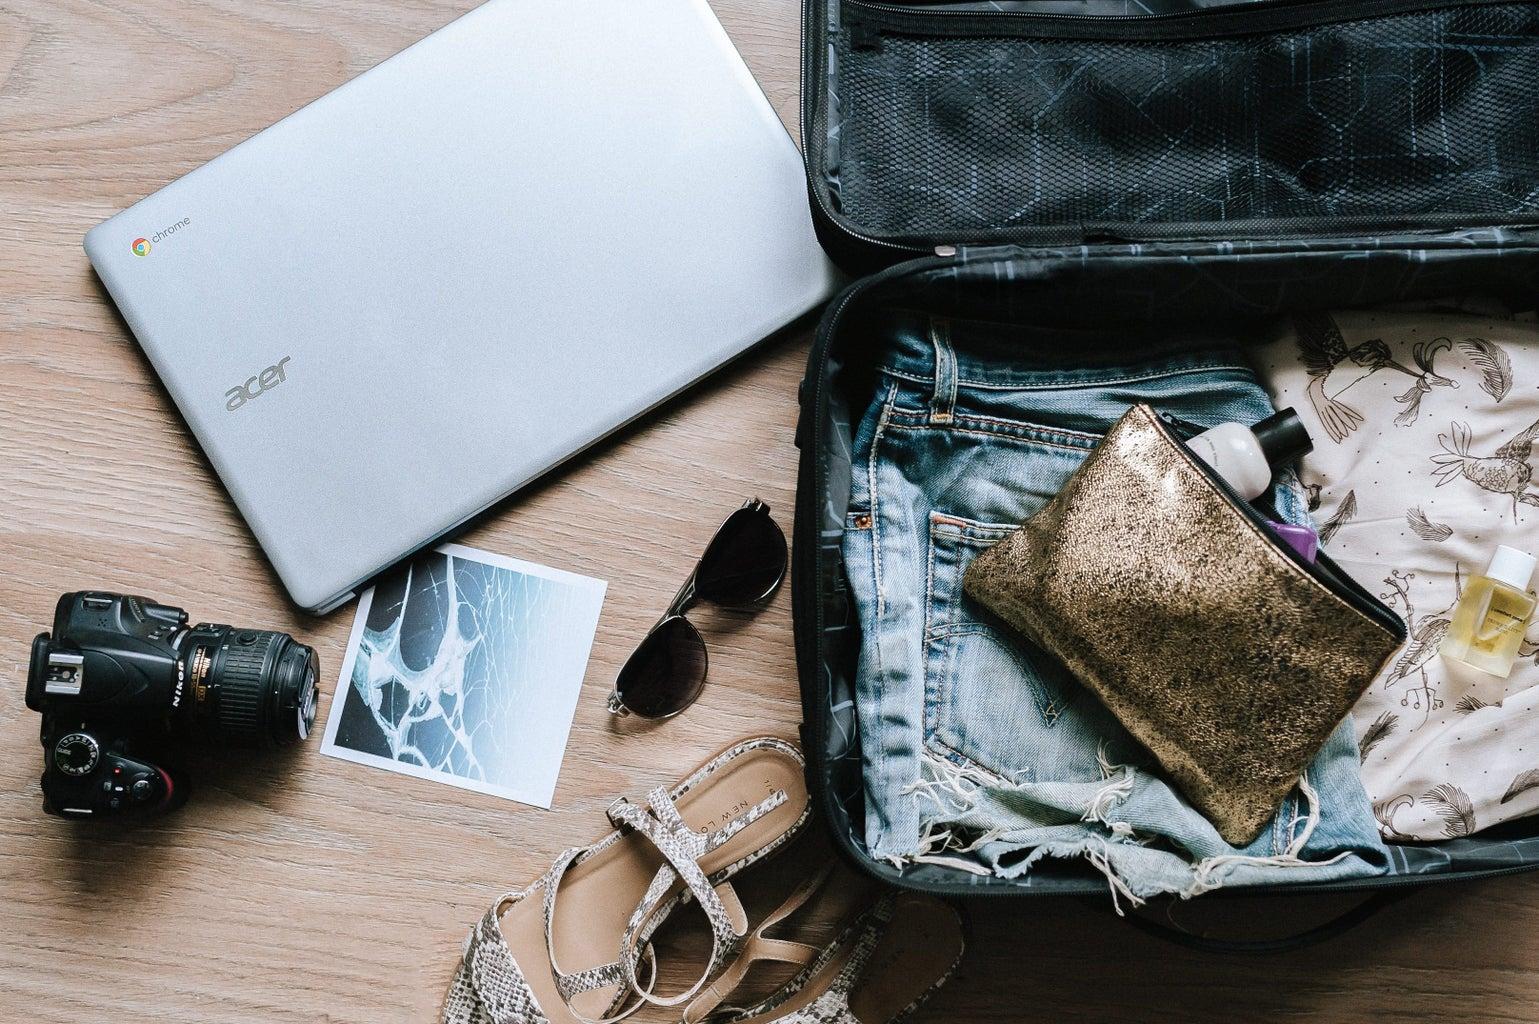 black DSLR camera near sunglasses and travel bag